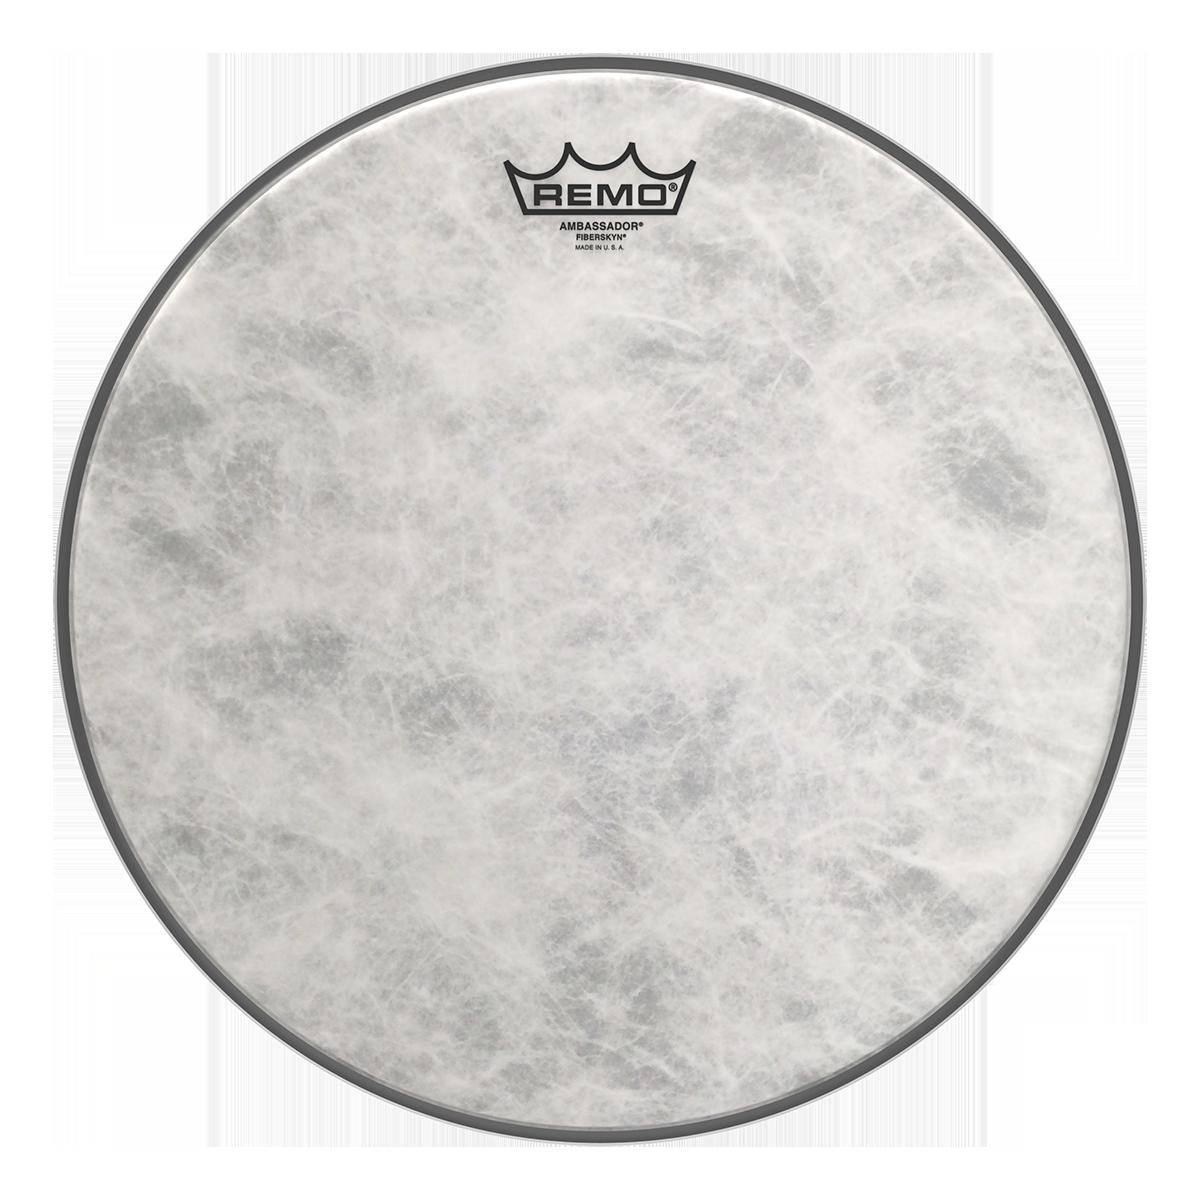 "Remo 10/"" Fiberskyn 3 Ambassador Drum Head FA-0510-00"